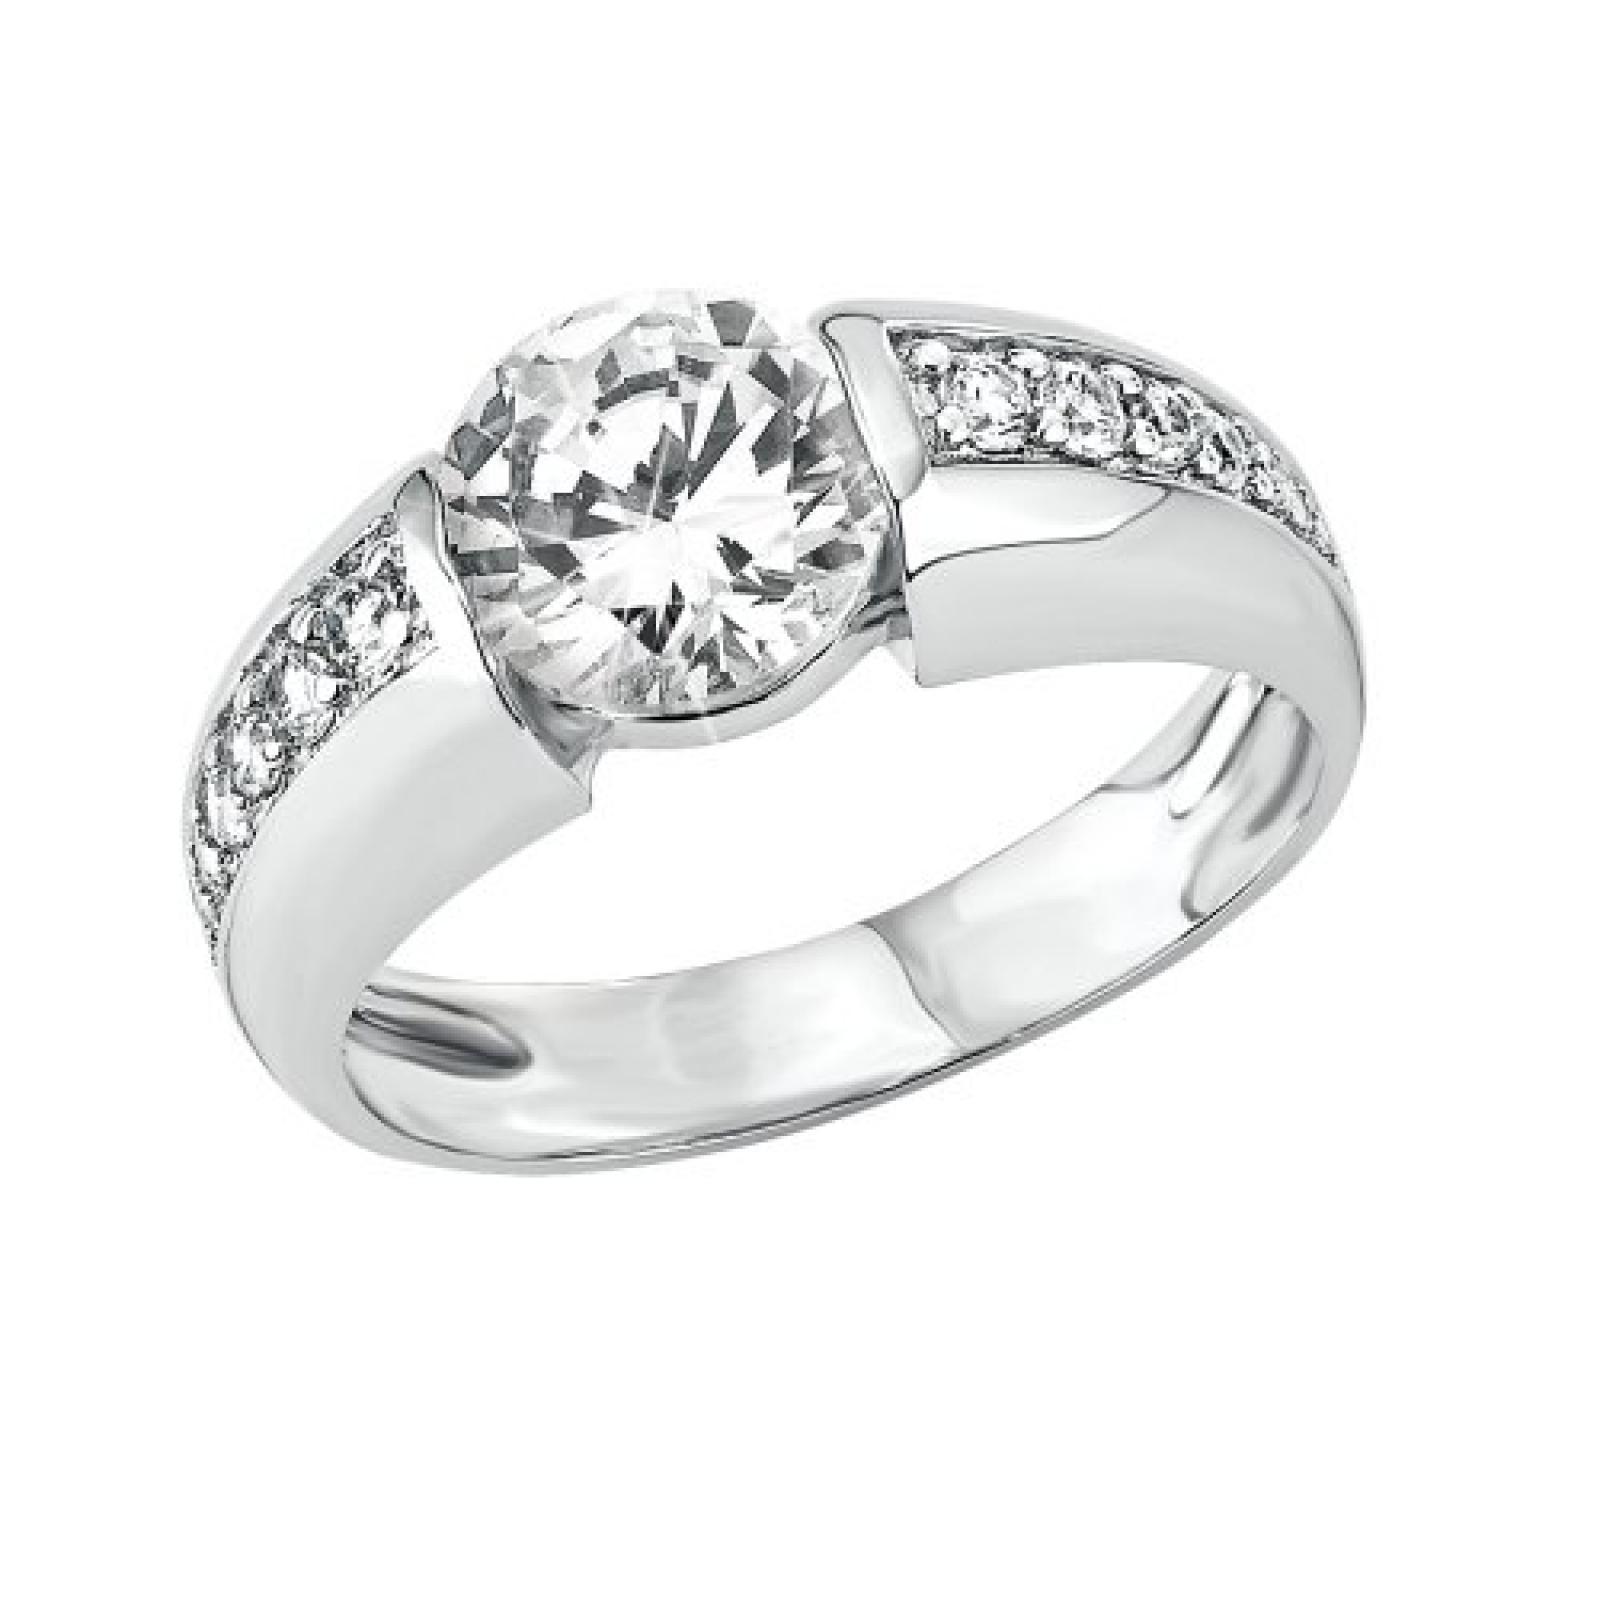 s.Oliver Jewels Damen-Ring Herbst Winter Kollektion 2013 925 Sterling Silber 4628